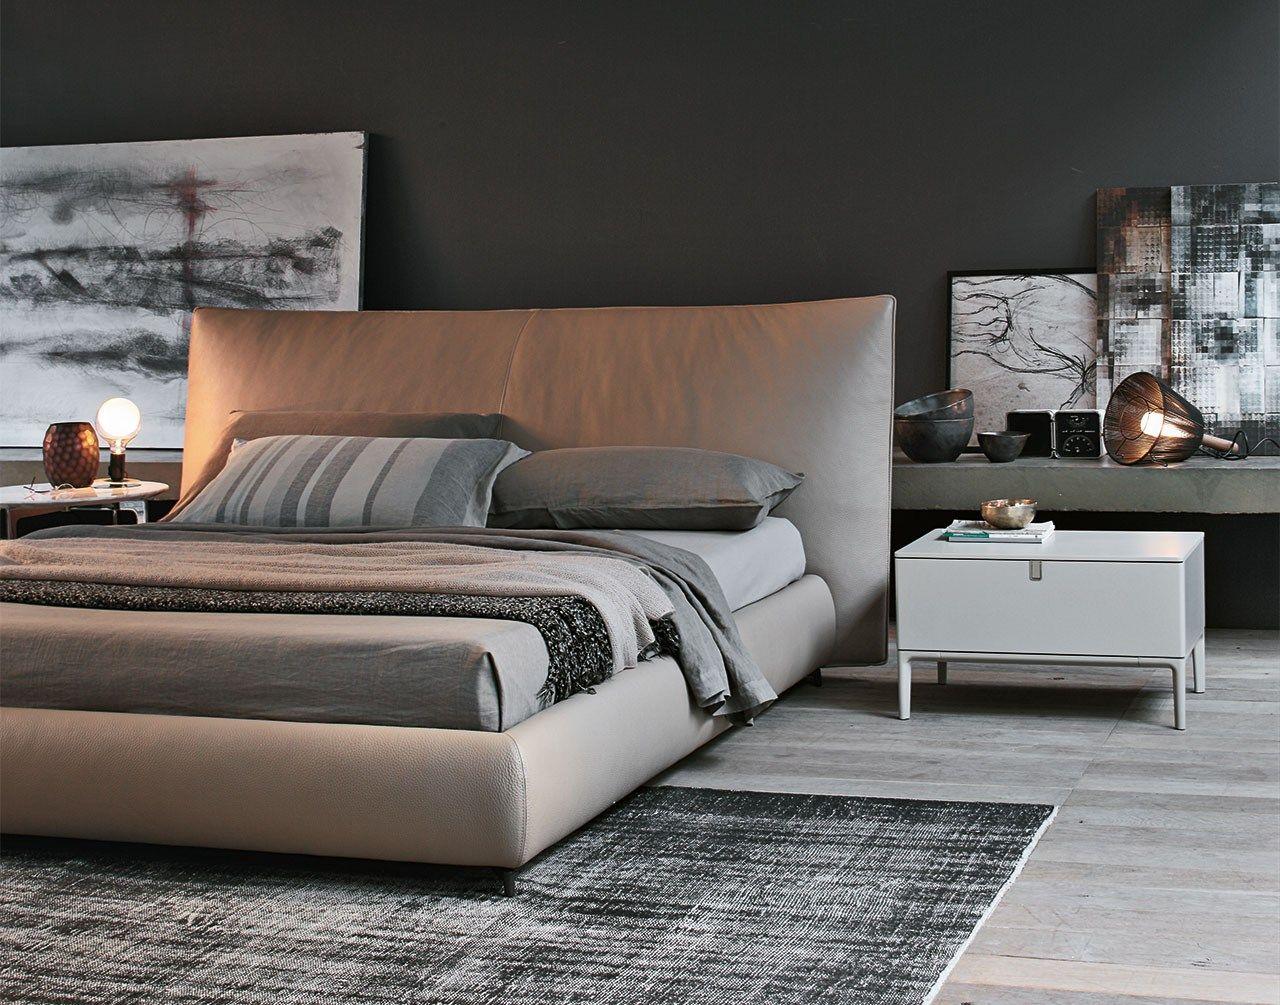 Suite letto by alivar design giuseppe bavuso - Testiera letto imbottita pelle ...